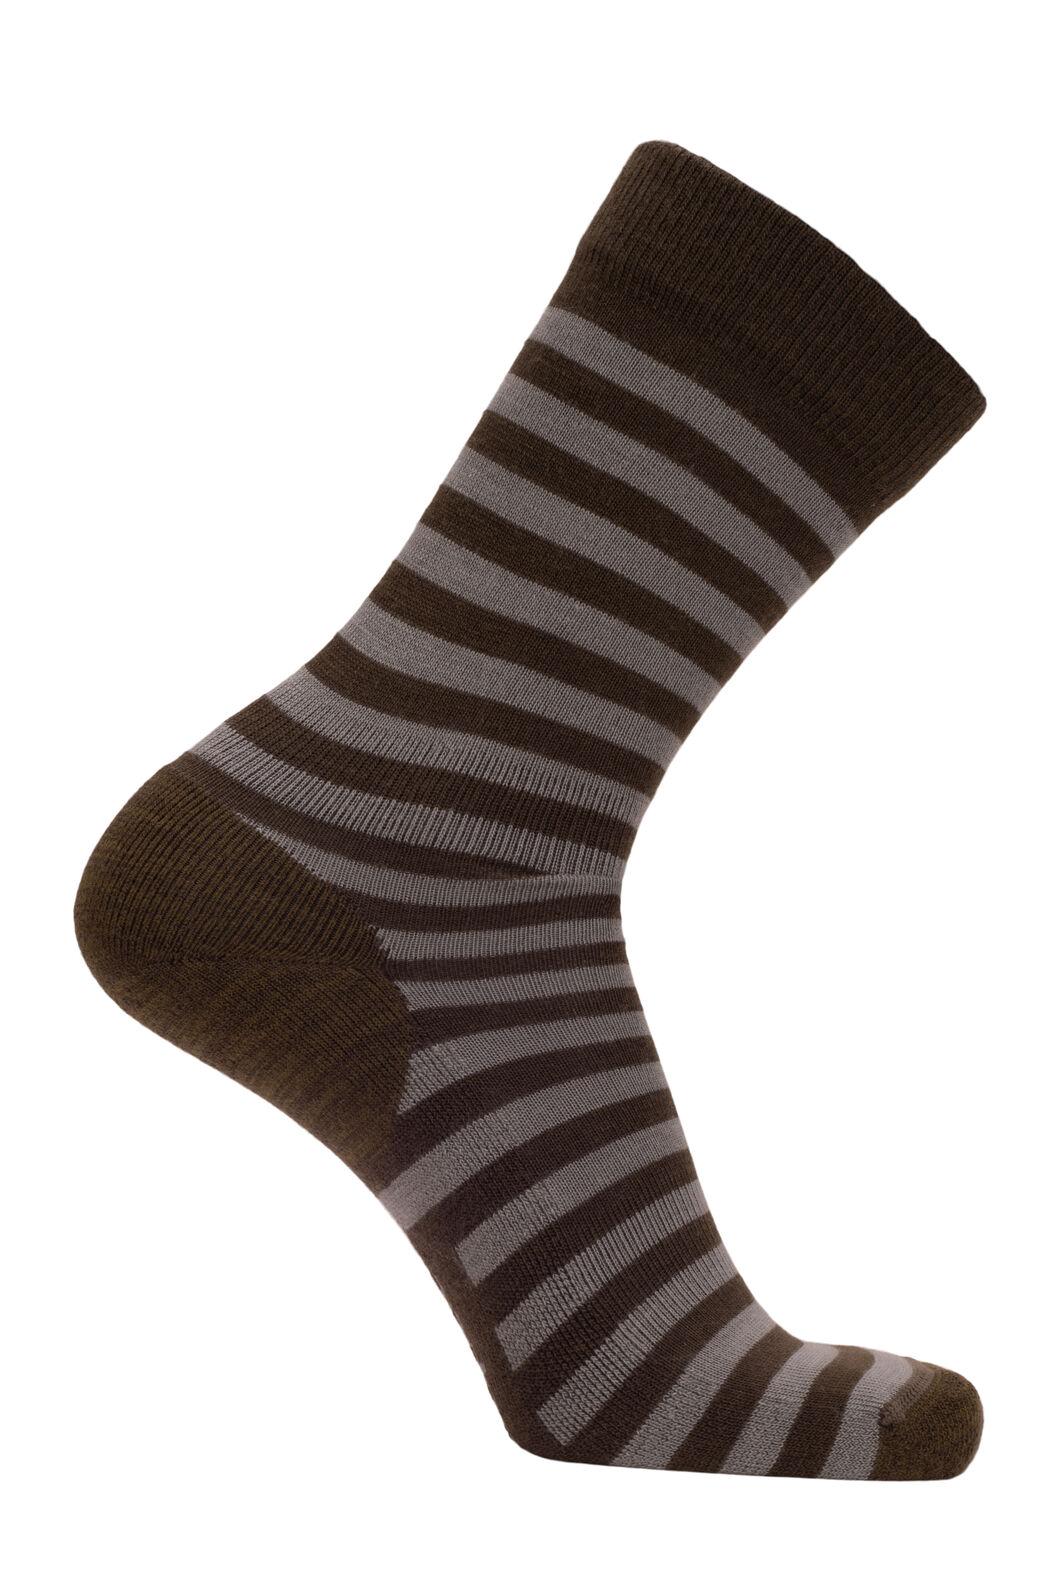 Macpac Merino Blend Footprint Socks, Olive Night Stripe, hi-res